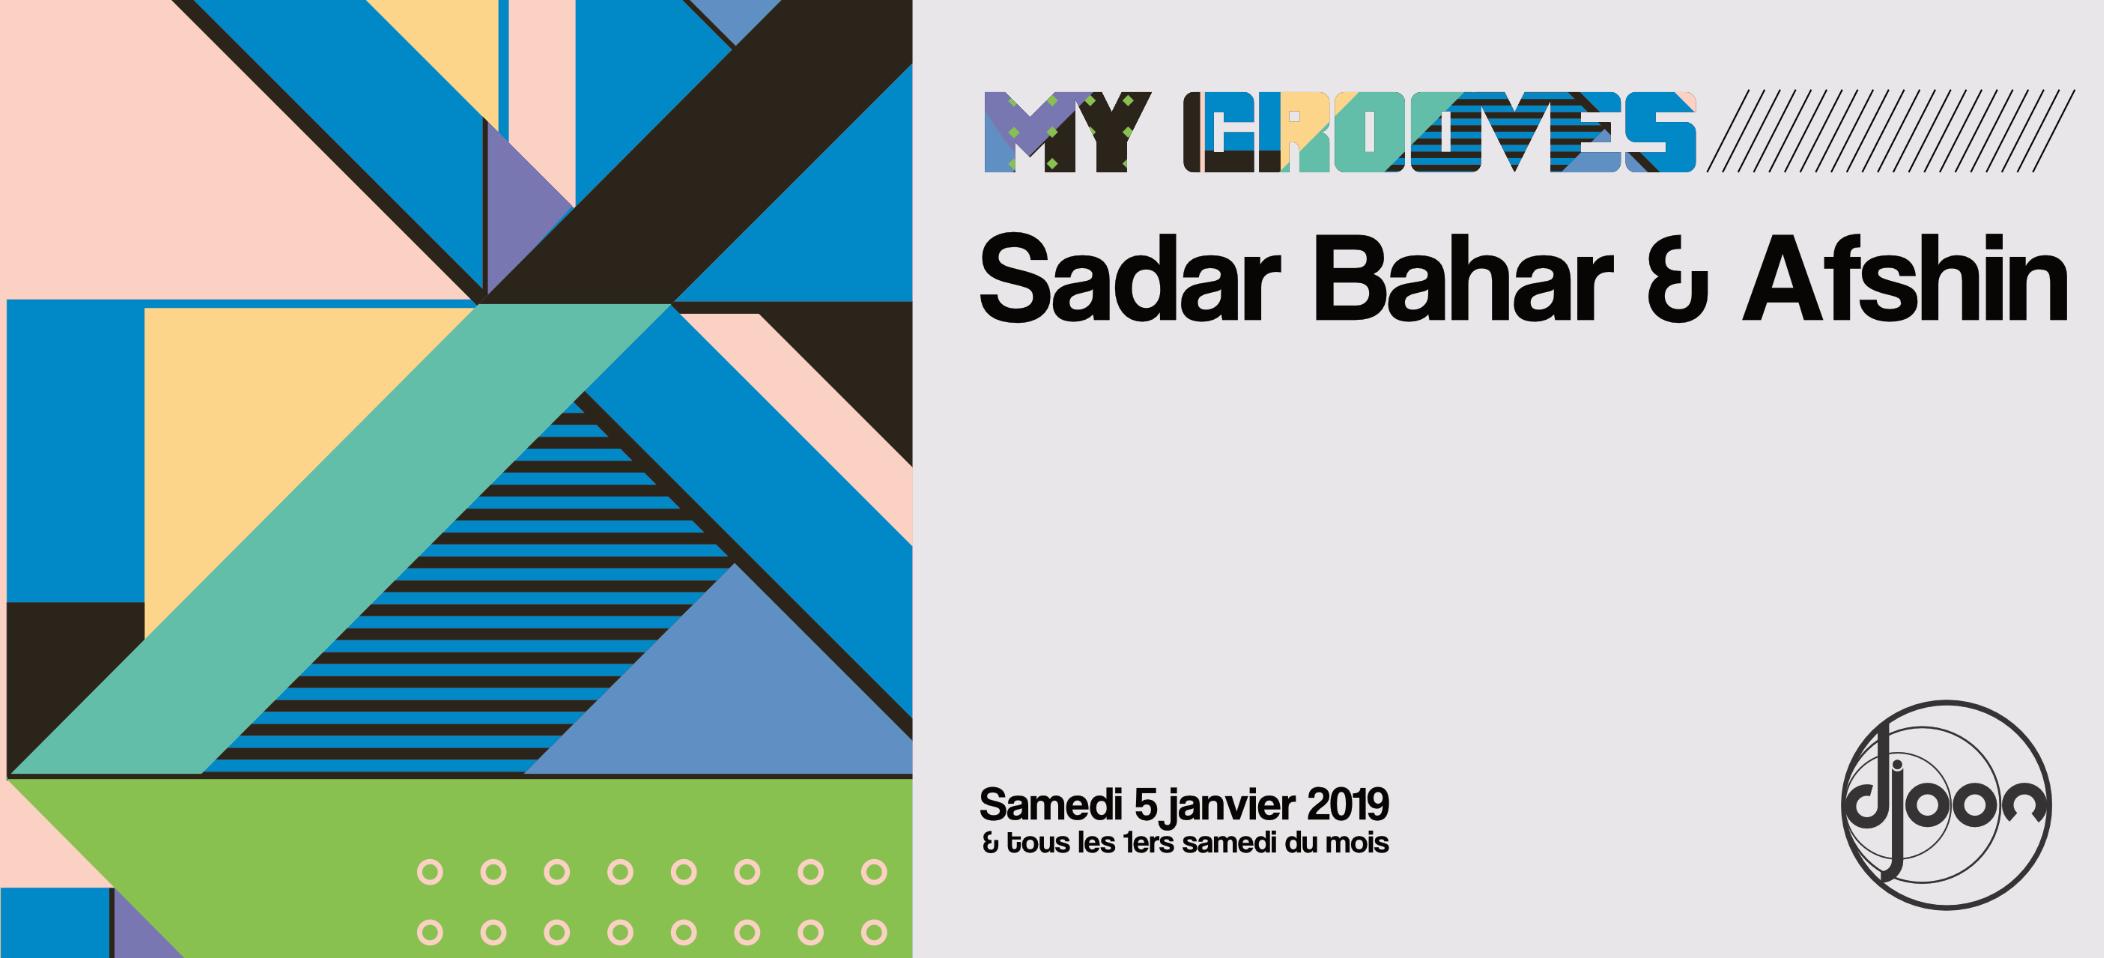 My Grooves: Sadar Bahar & Afshin